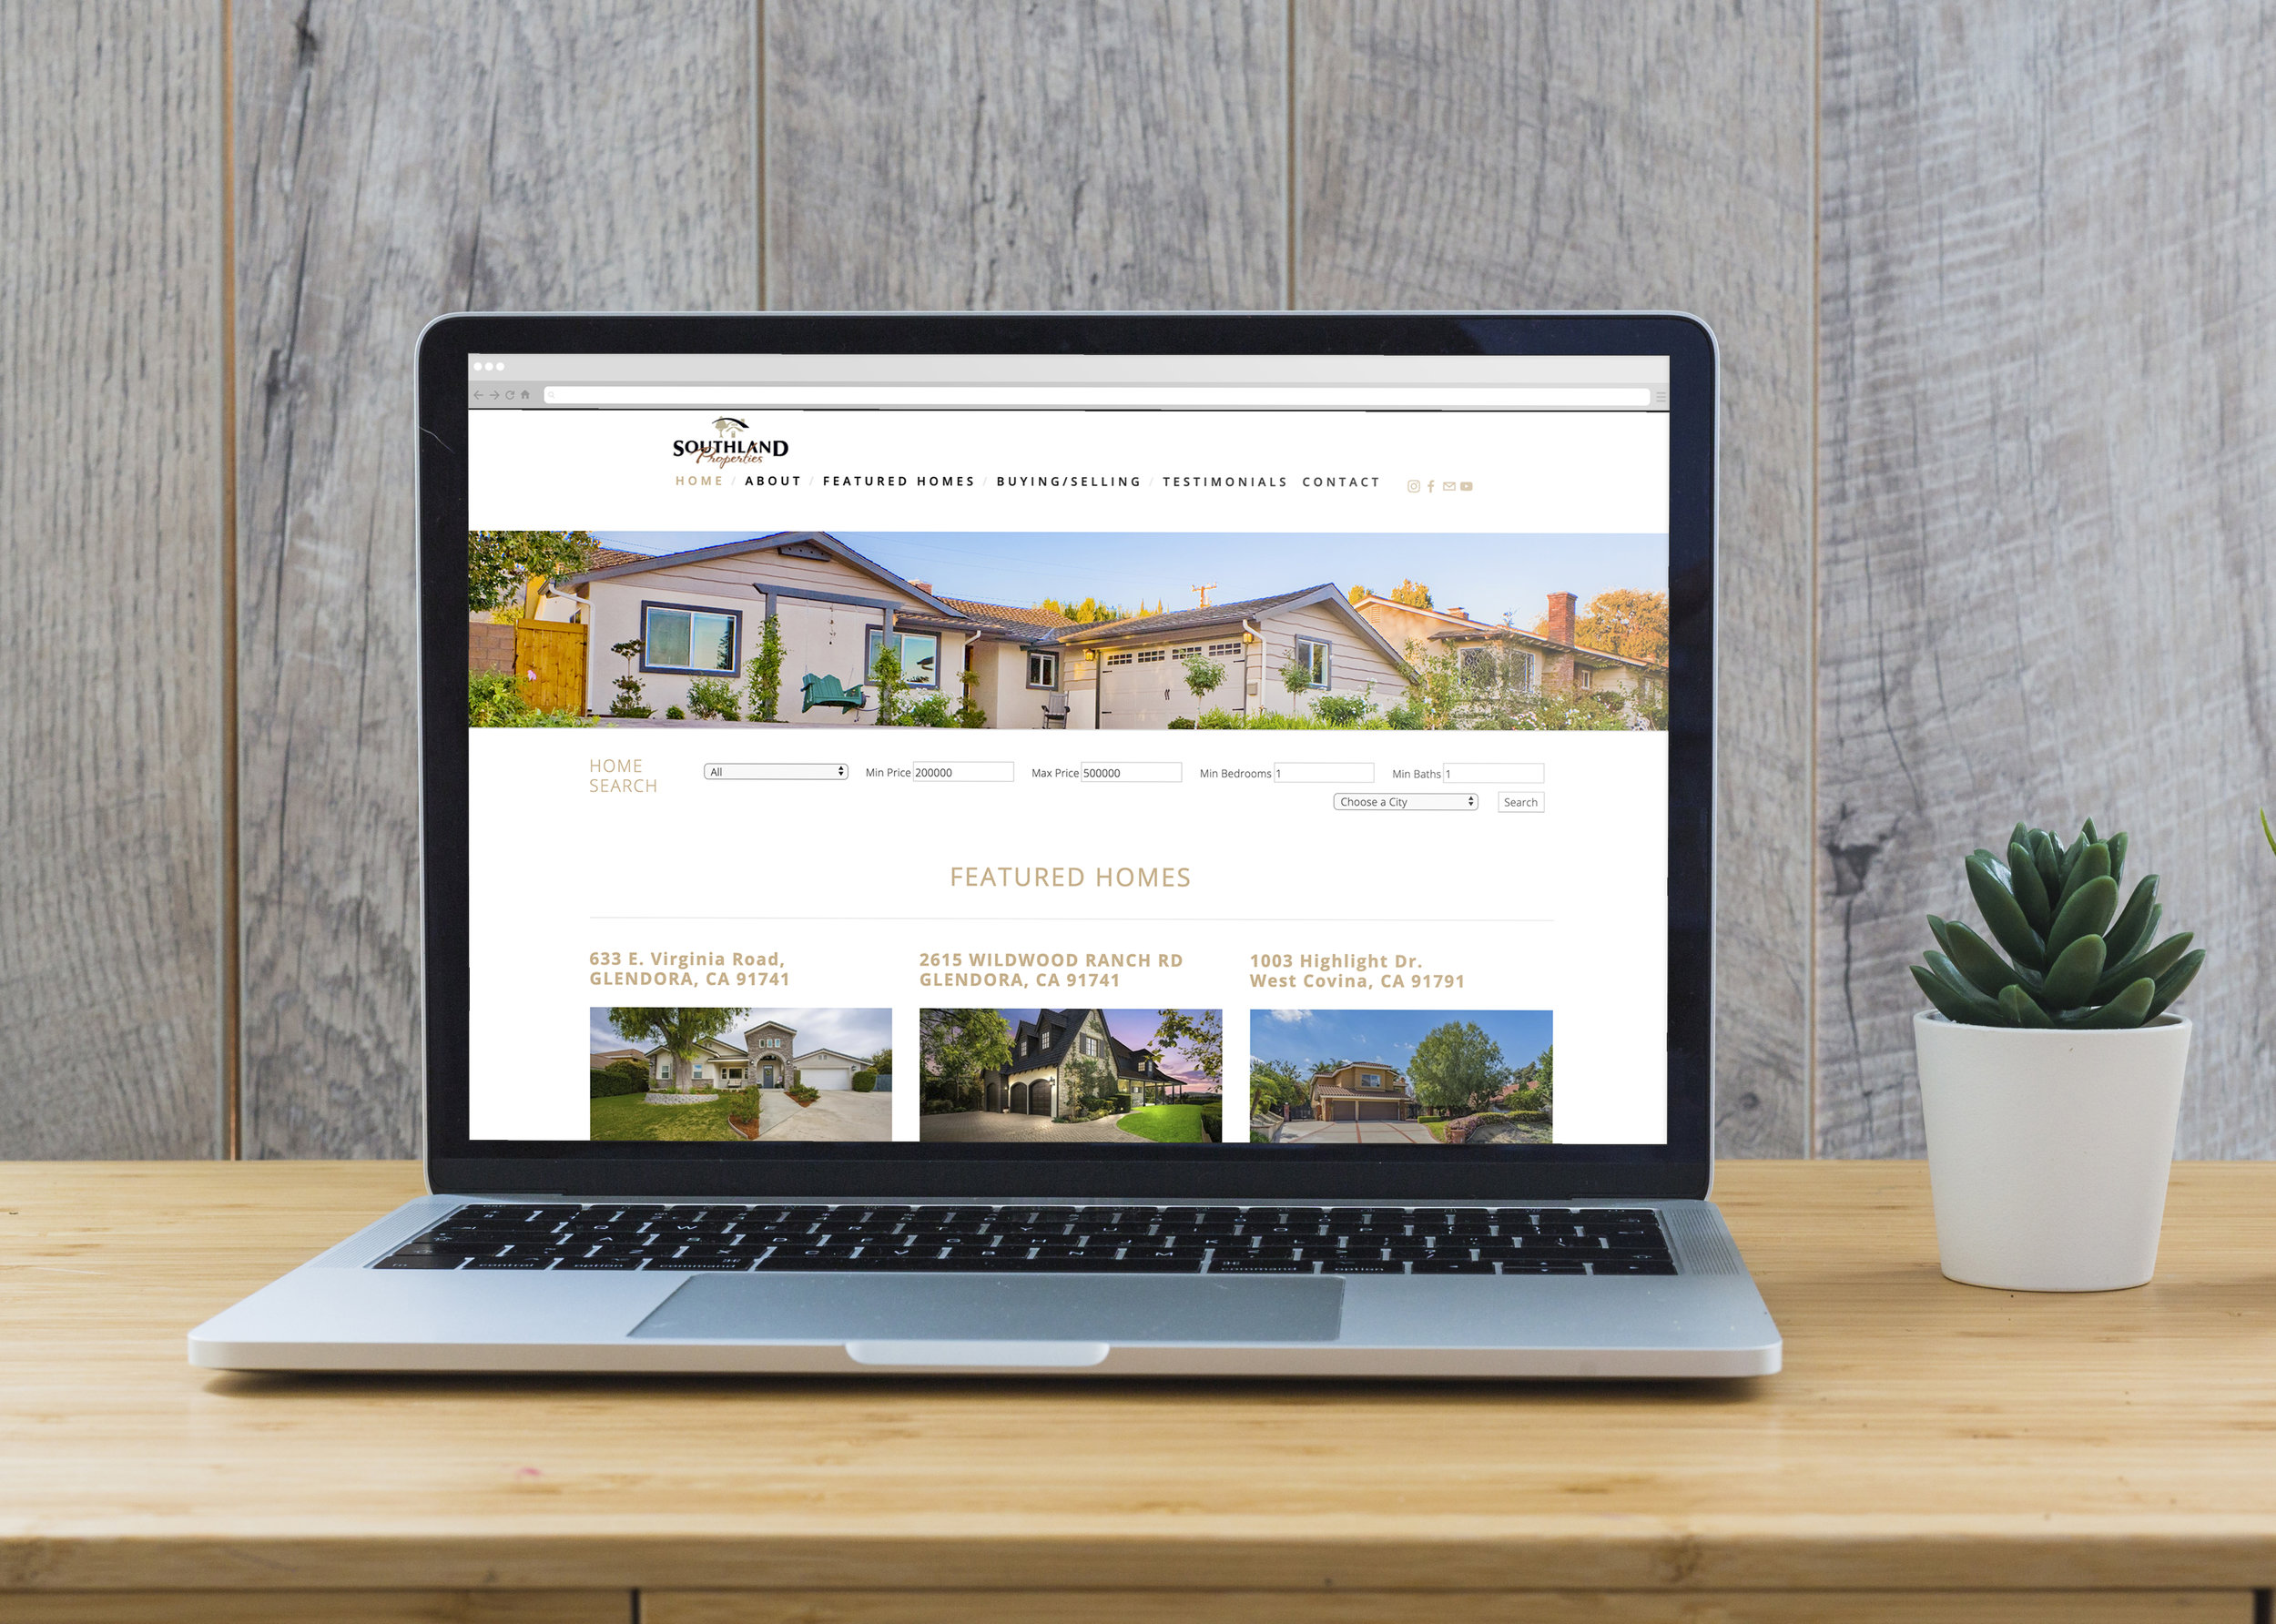 southland properties.jpg